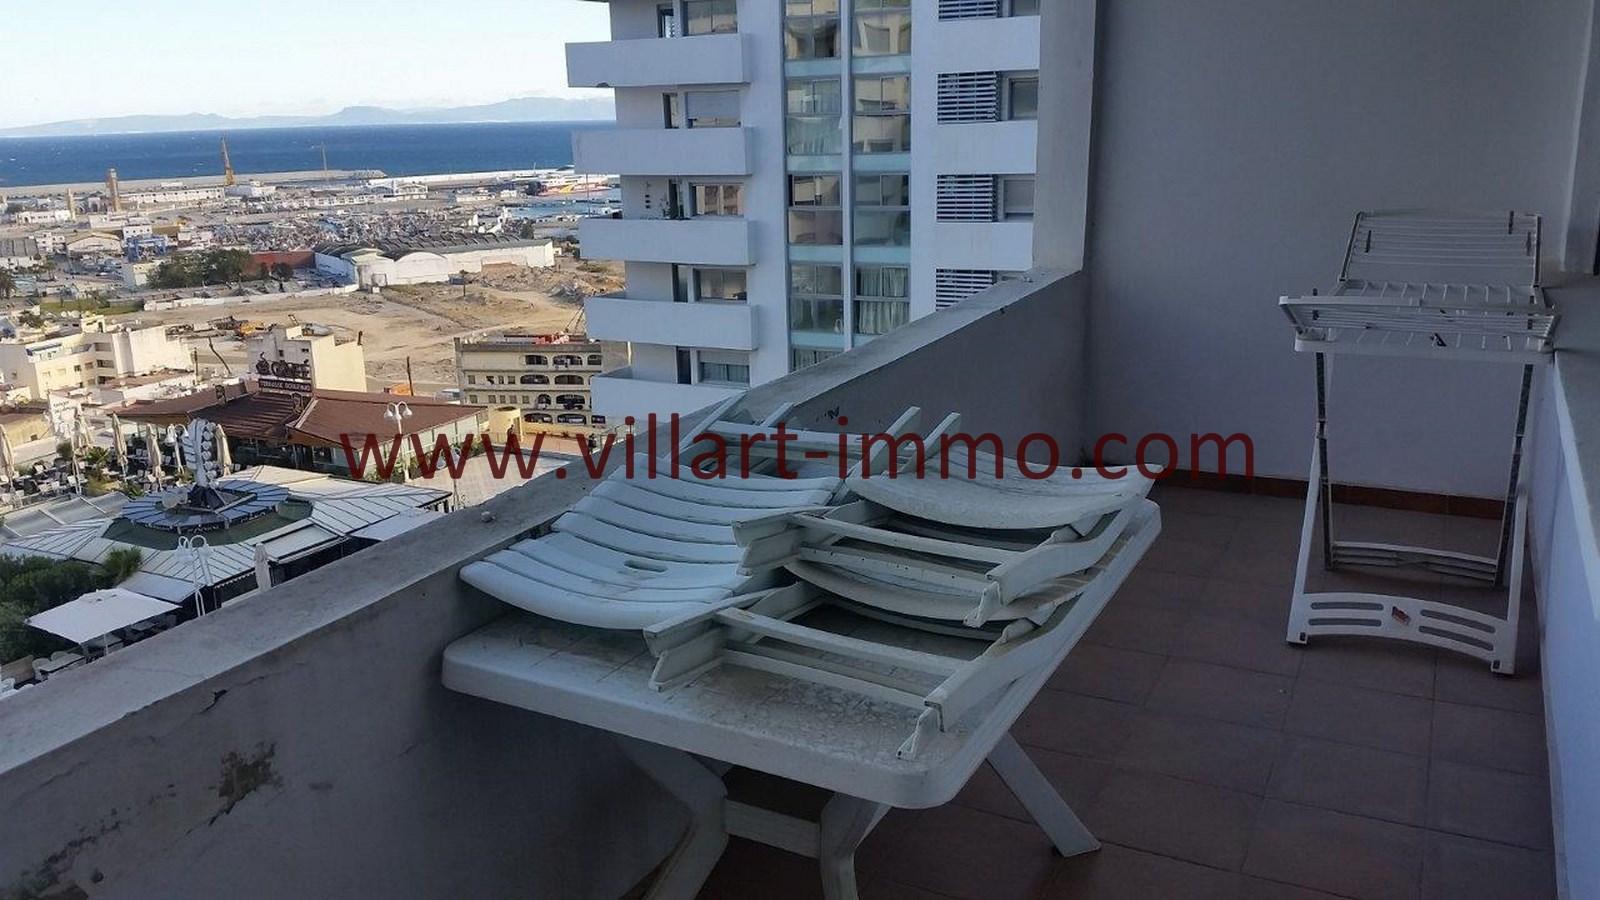 9-Vente-Appartement-Tanger-Centre-De-Ville-Terrasse-VA576-Villart Immo